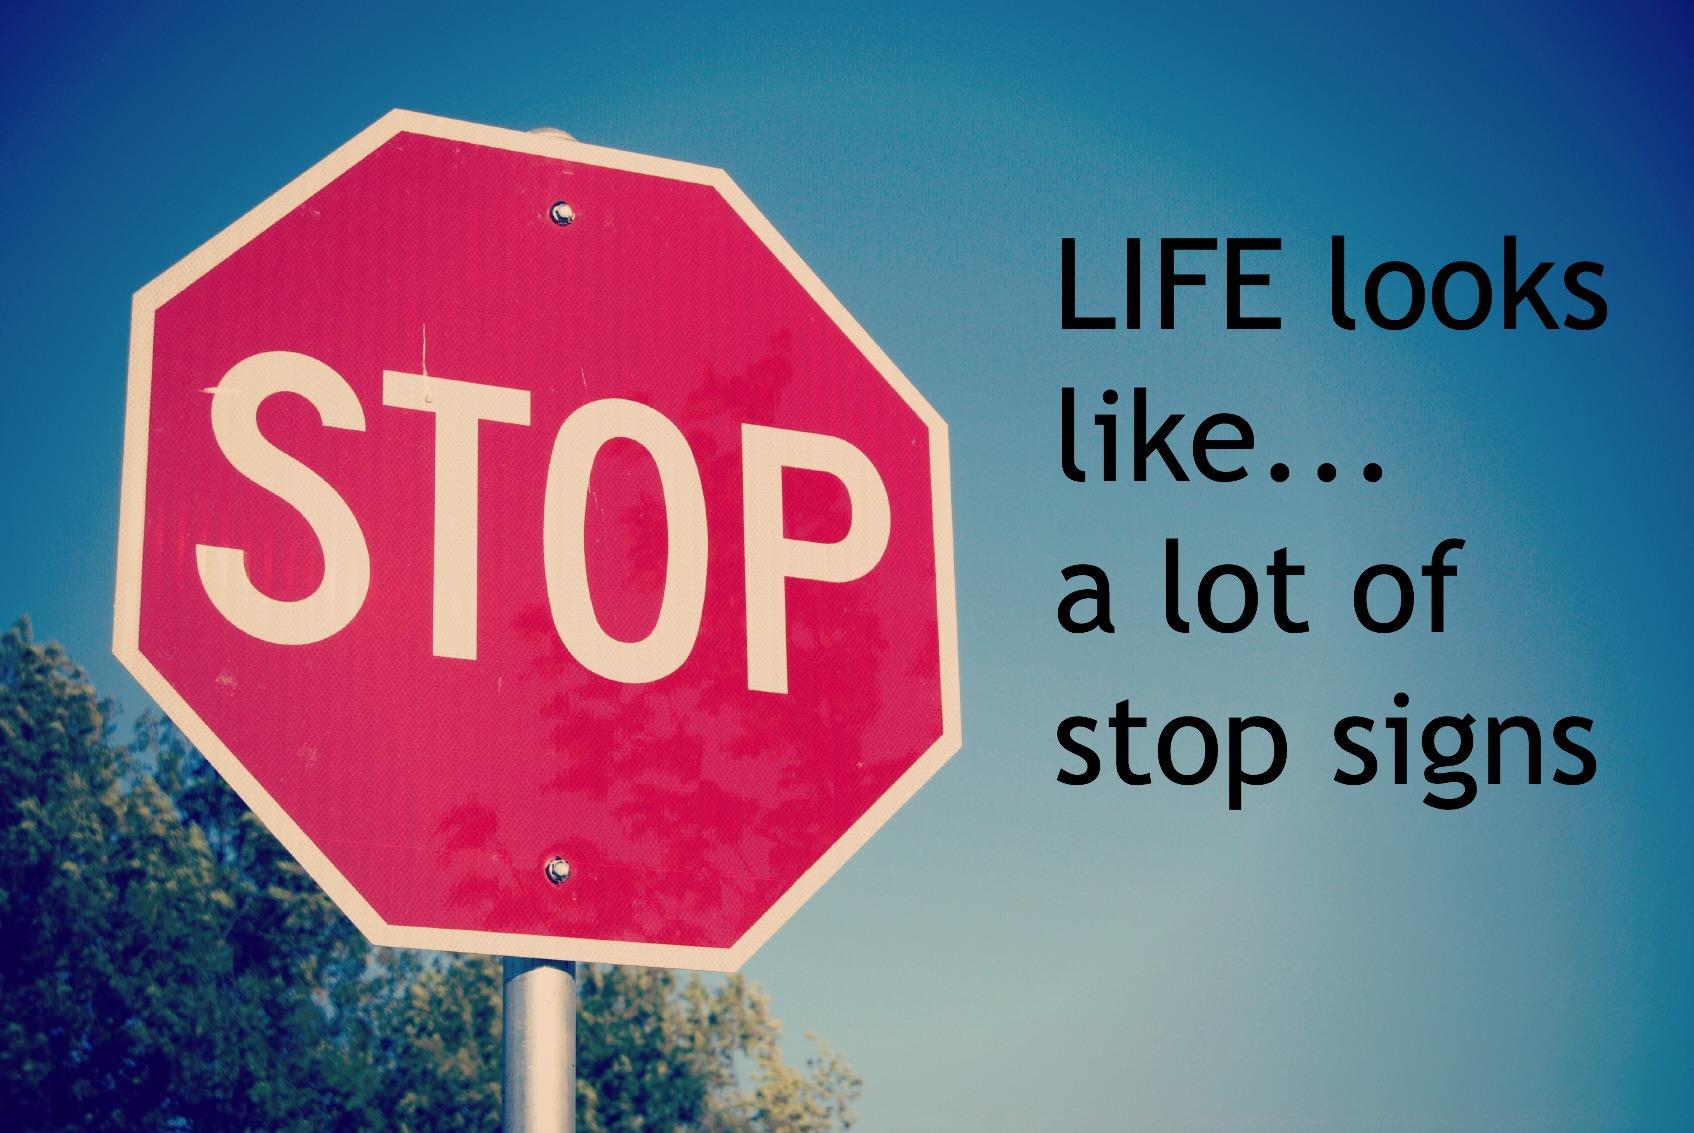 LIFEstop-sign